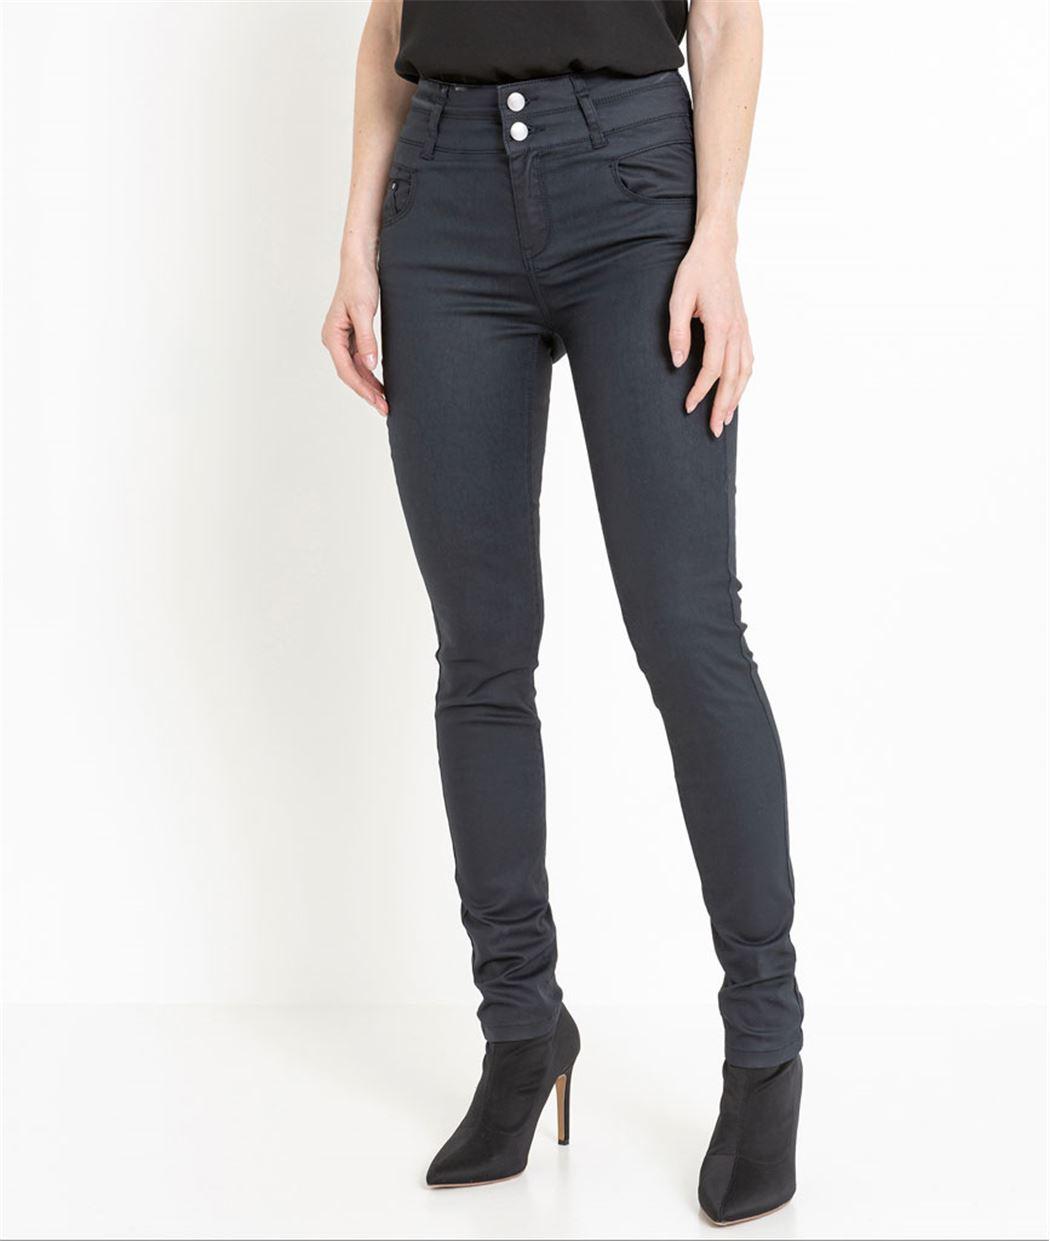 Pantalon femme enduit taille haute MARINE